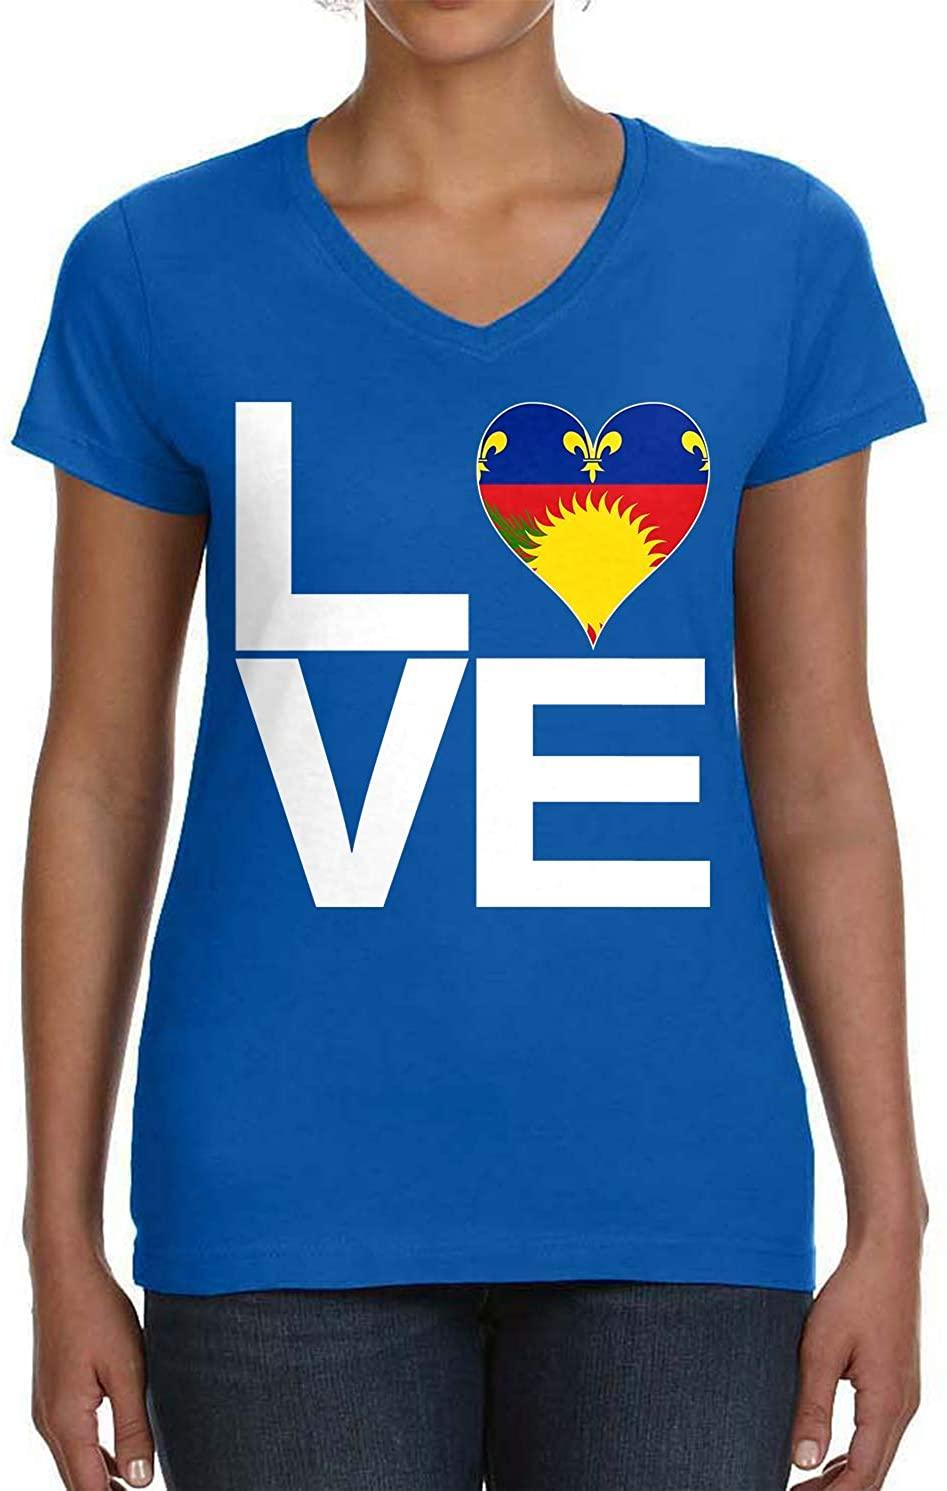 Tenacitee Women's Love Block Guadeloupe Heart V-Neck T-Shirt